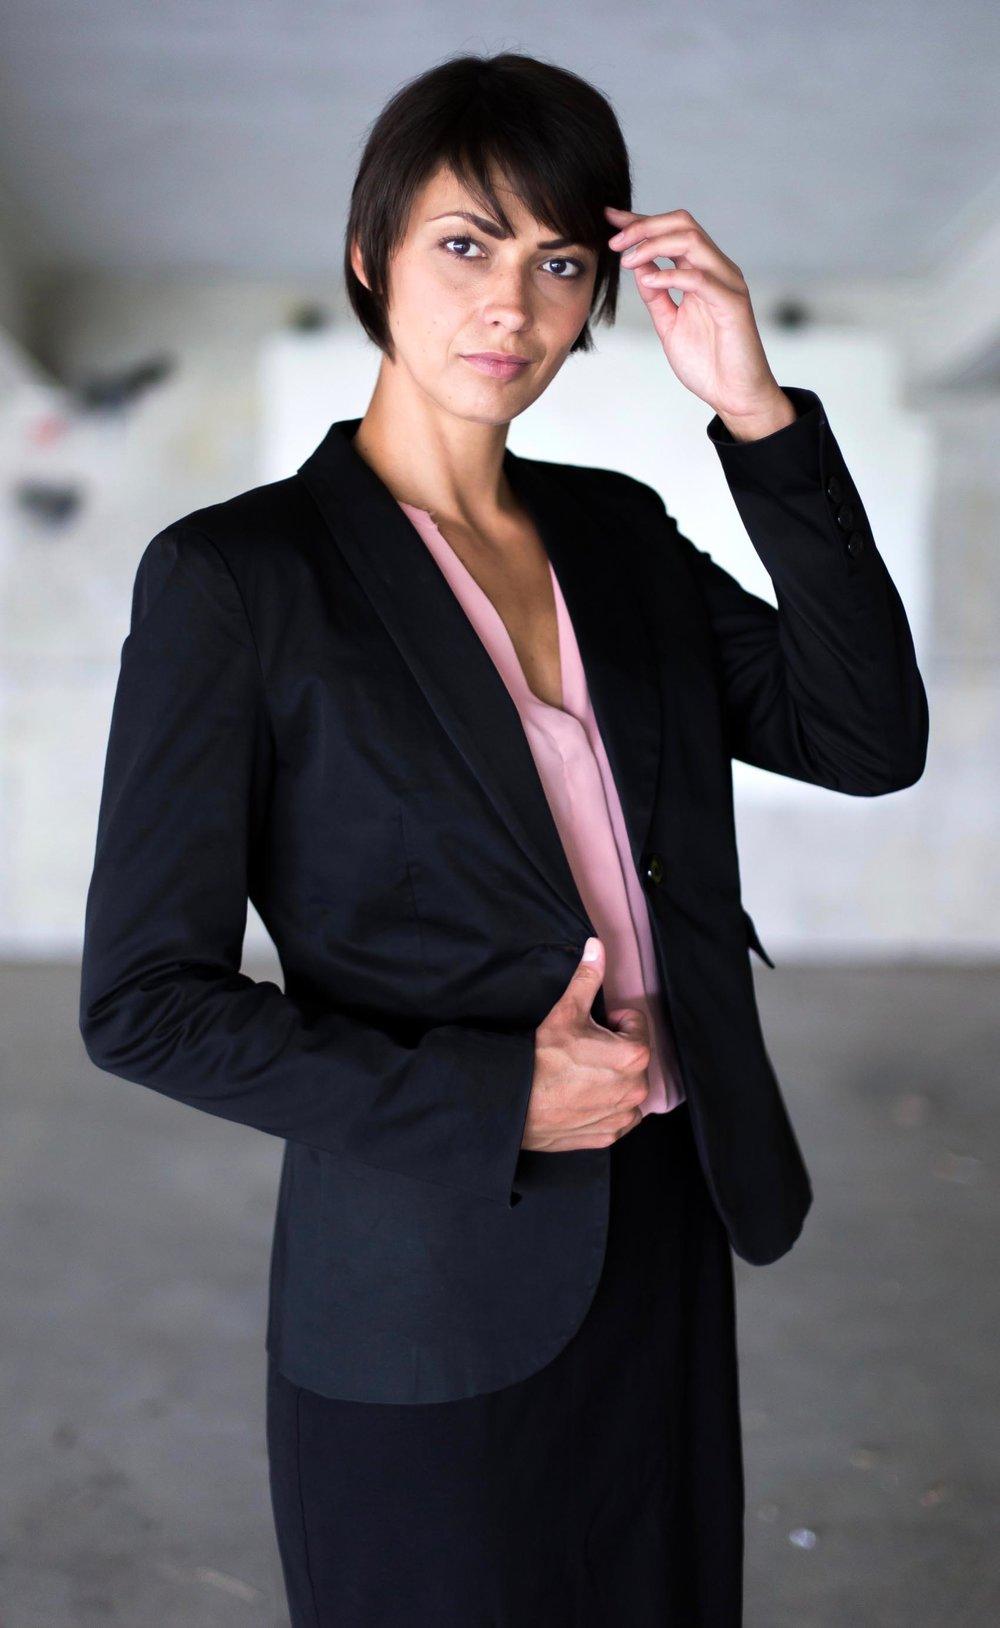 Kristin im Business Anzug